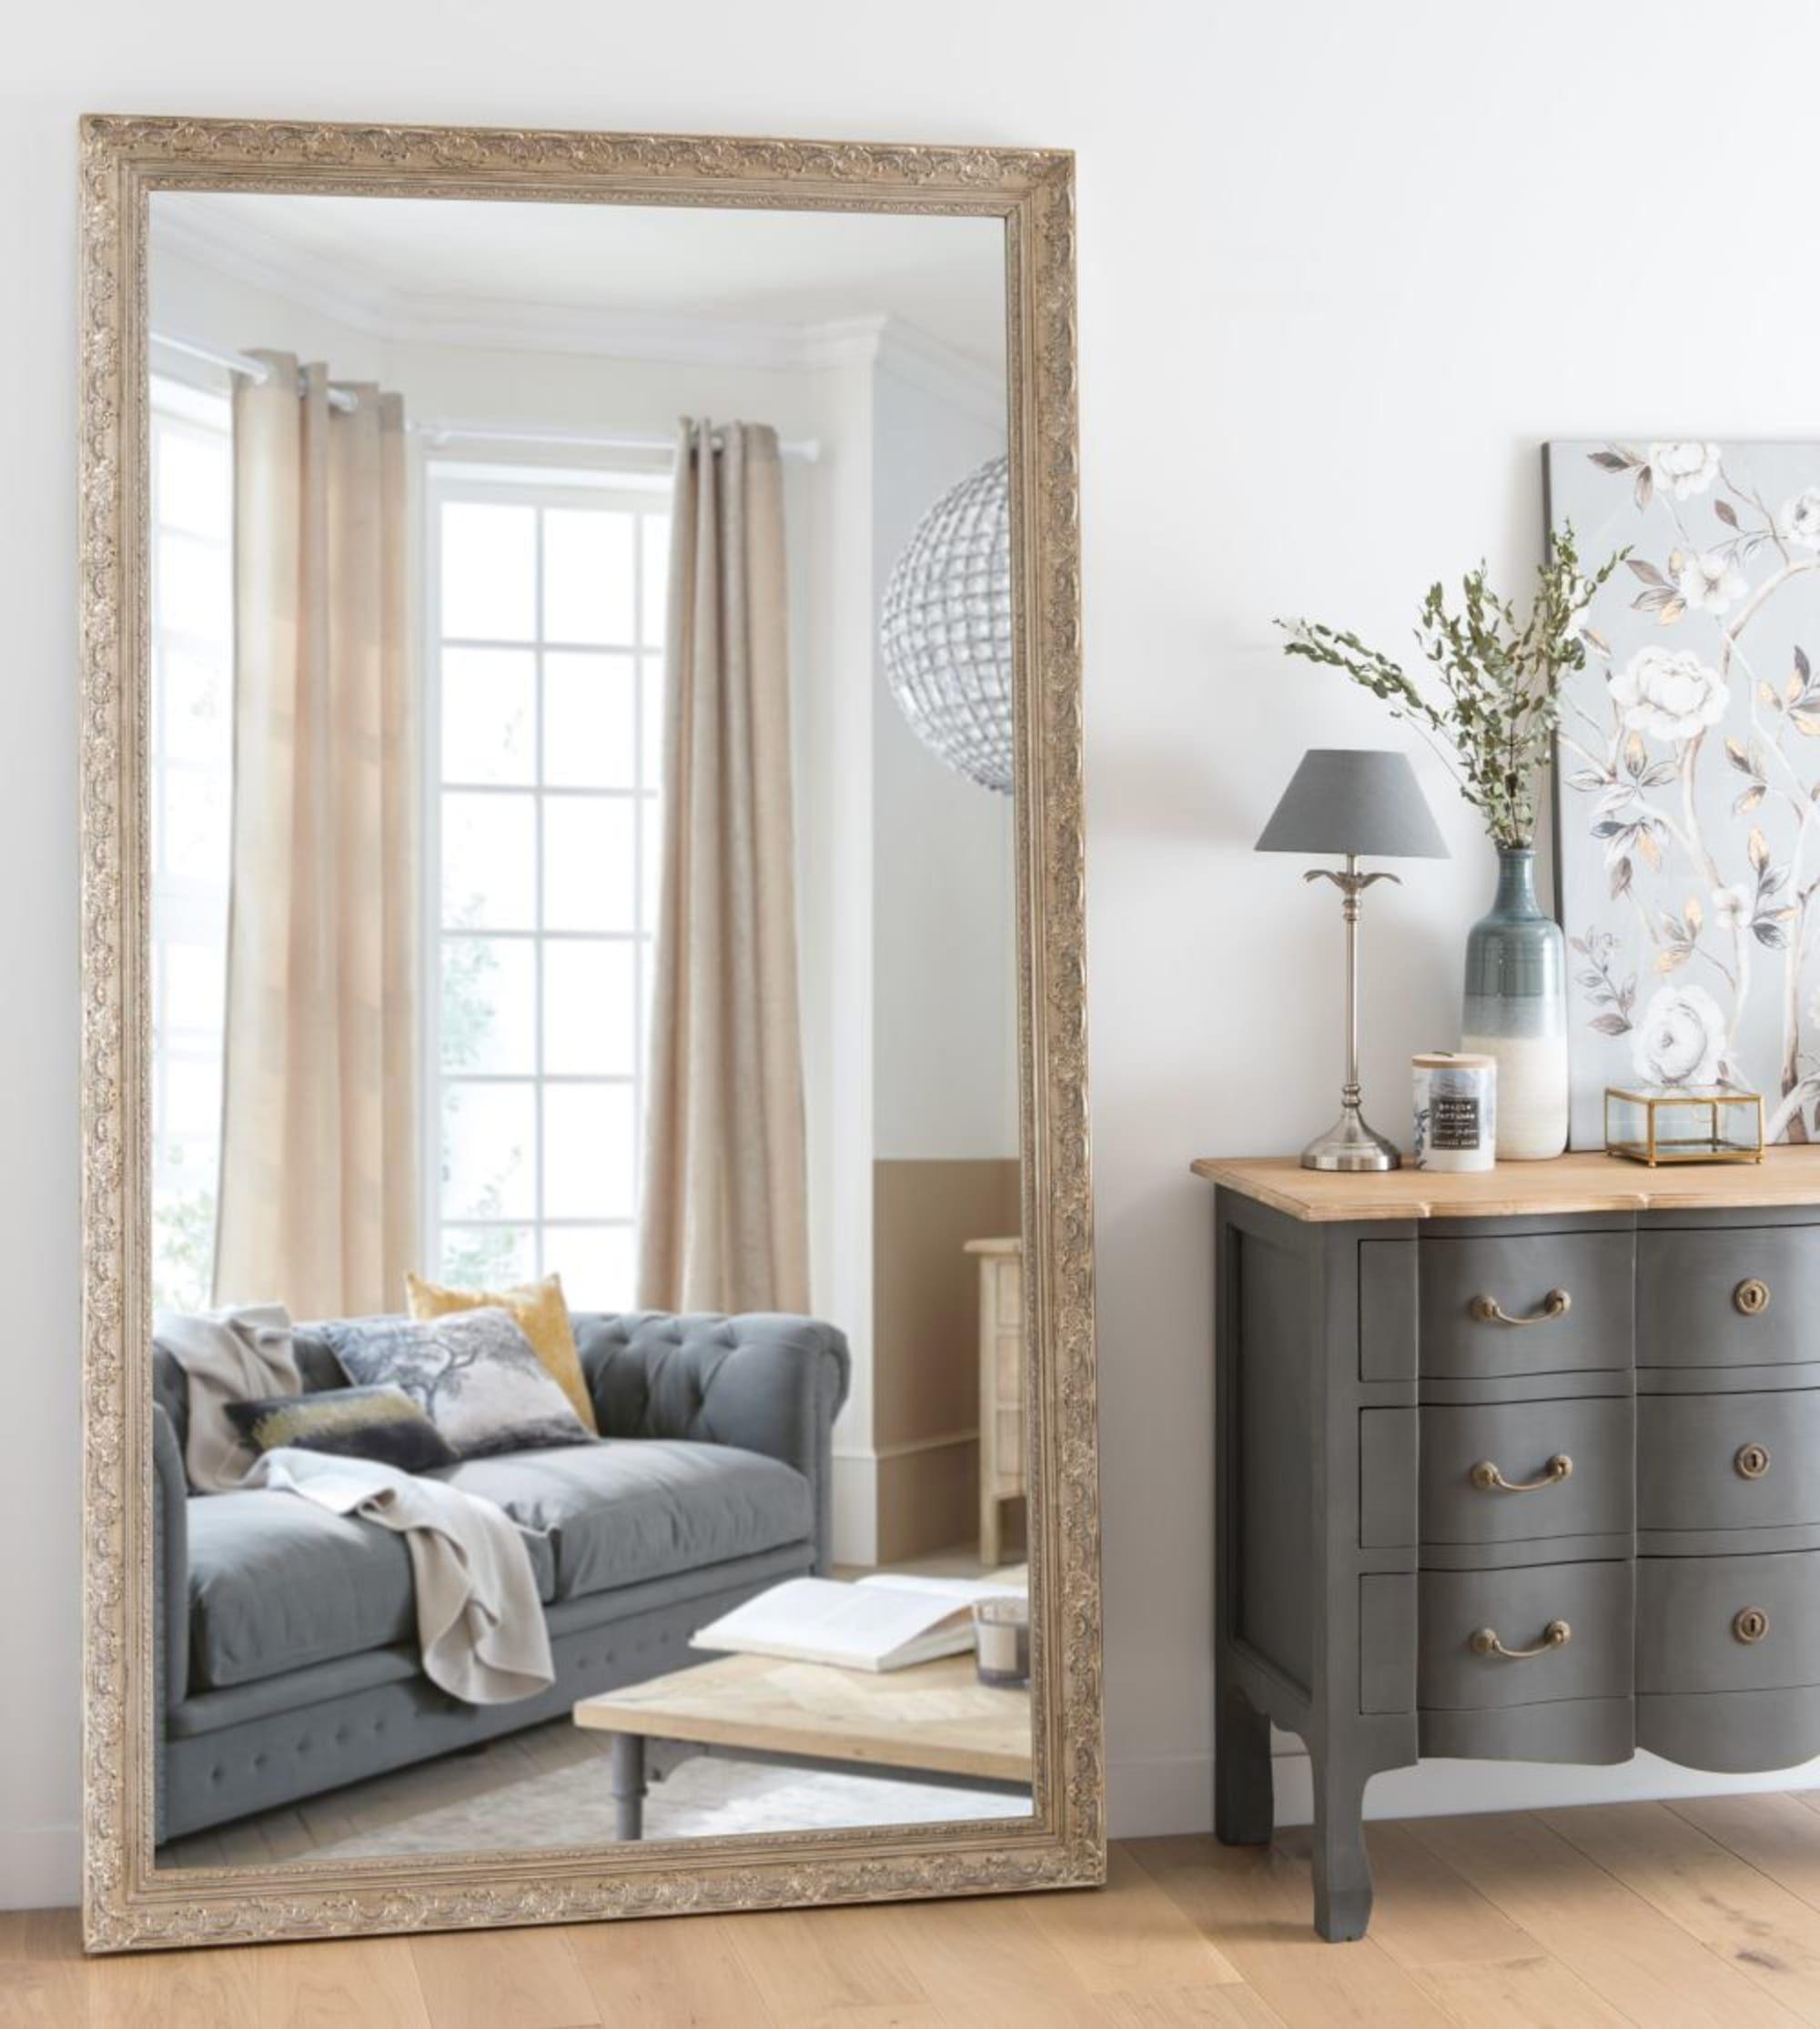 Miroir Sculpte Irise 120x210 Maisons Du Monde Flat Interior Large Bedroom Mirror Bedroom Interior